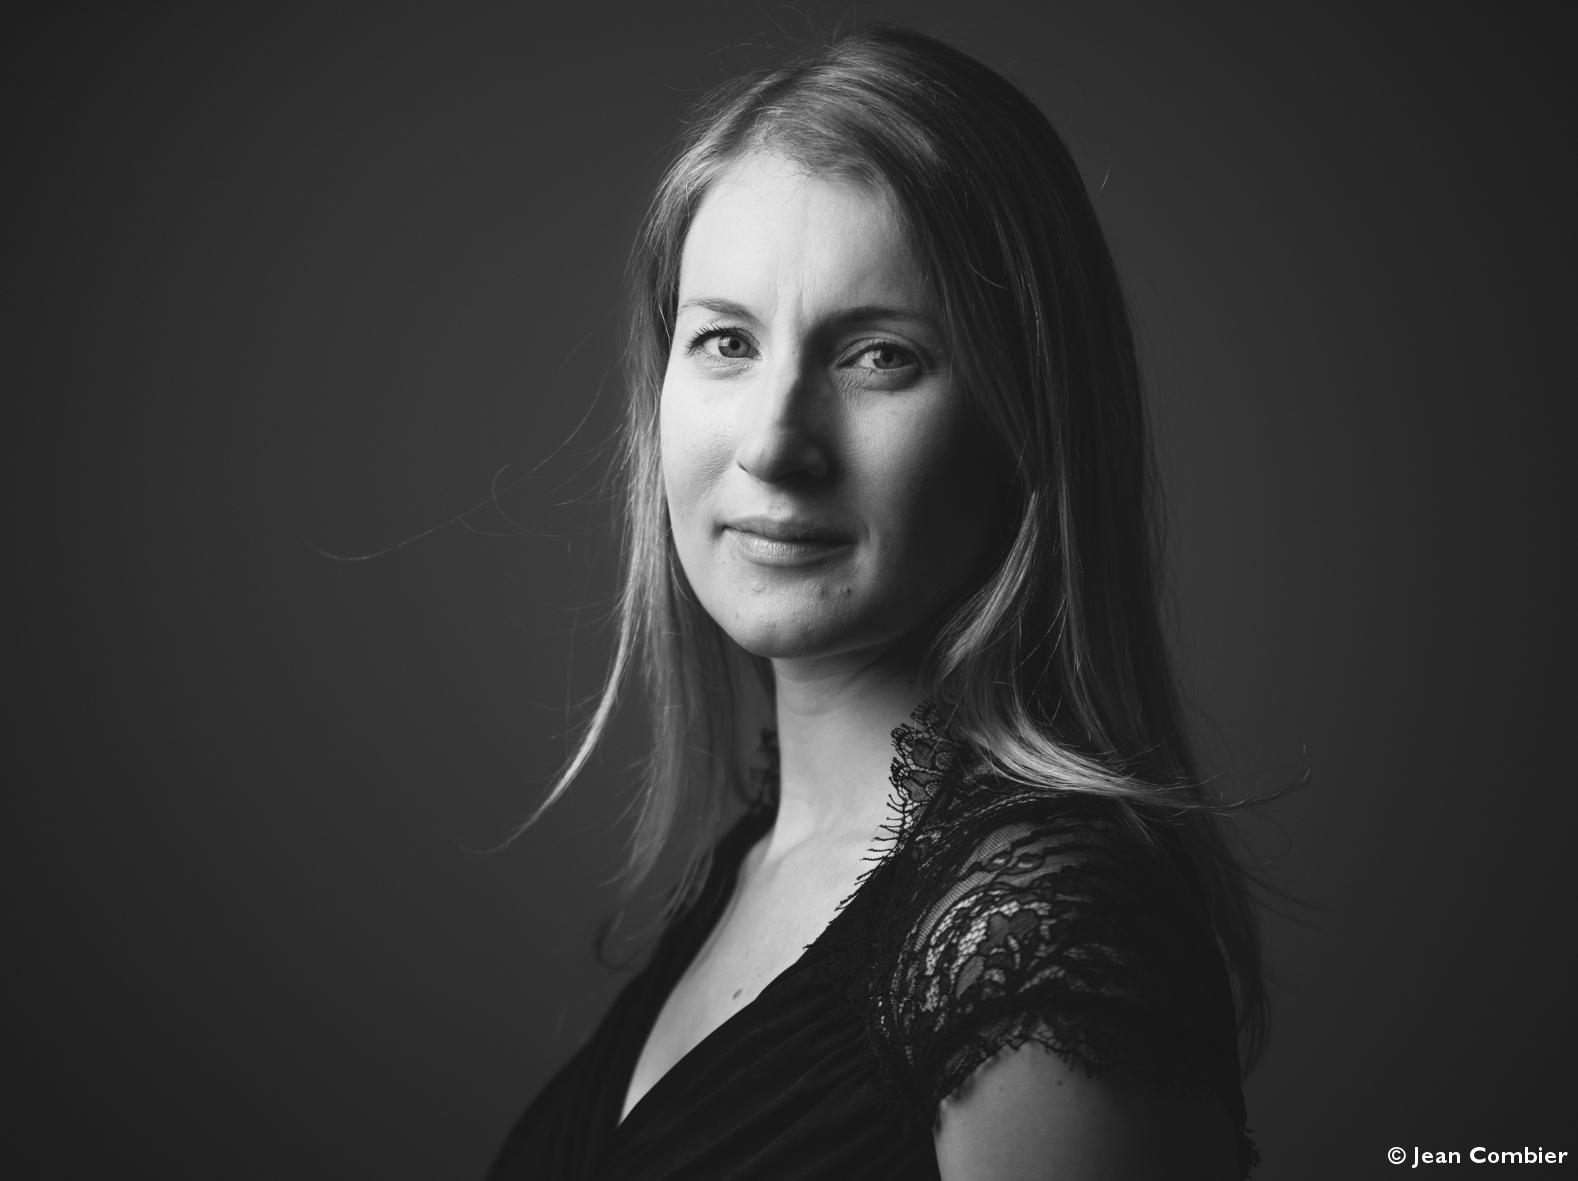 concert-hostel-dieu-NEWHOUSE-Heather-soprano-credit-J.Combier